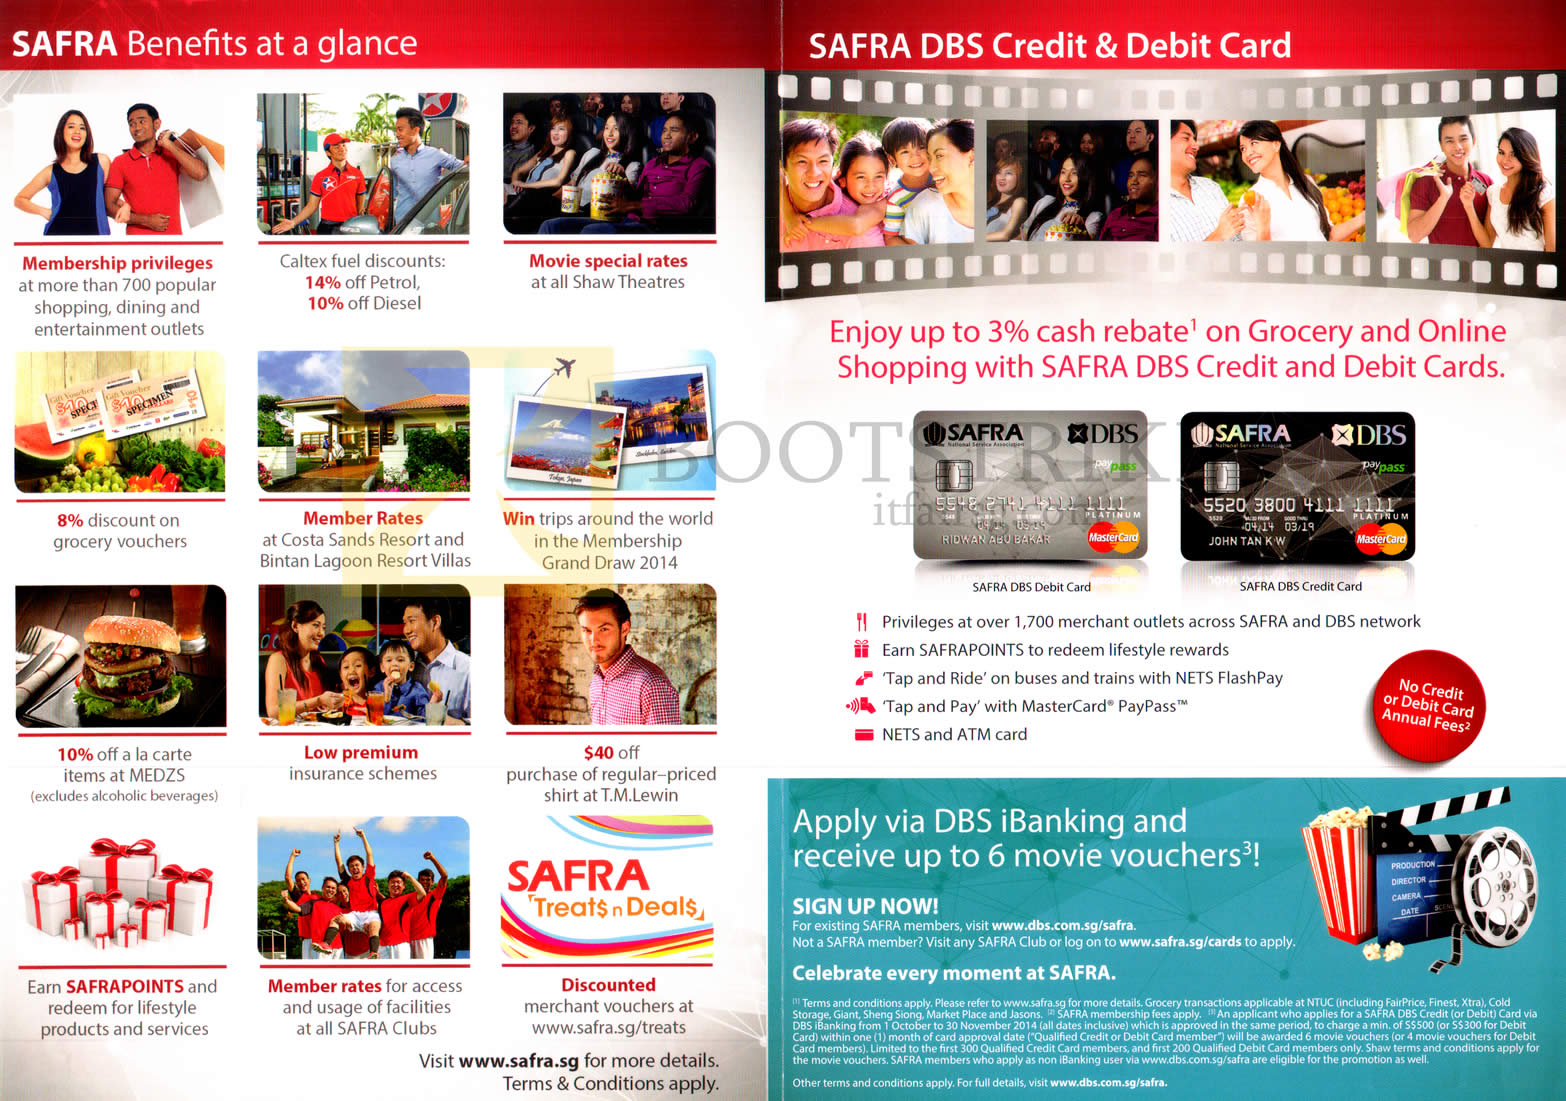 SITEX 2014 price list image brochure of Safra Benefits, DBS Credit, Debit Card Cash Rebates